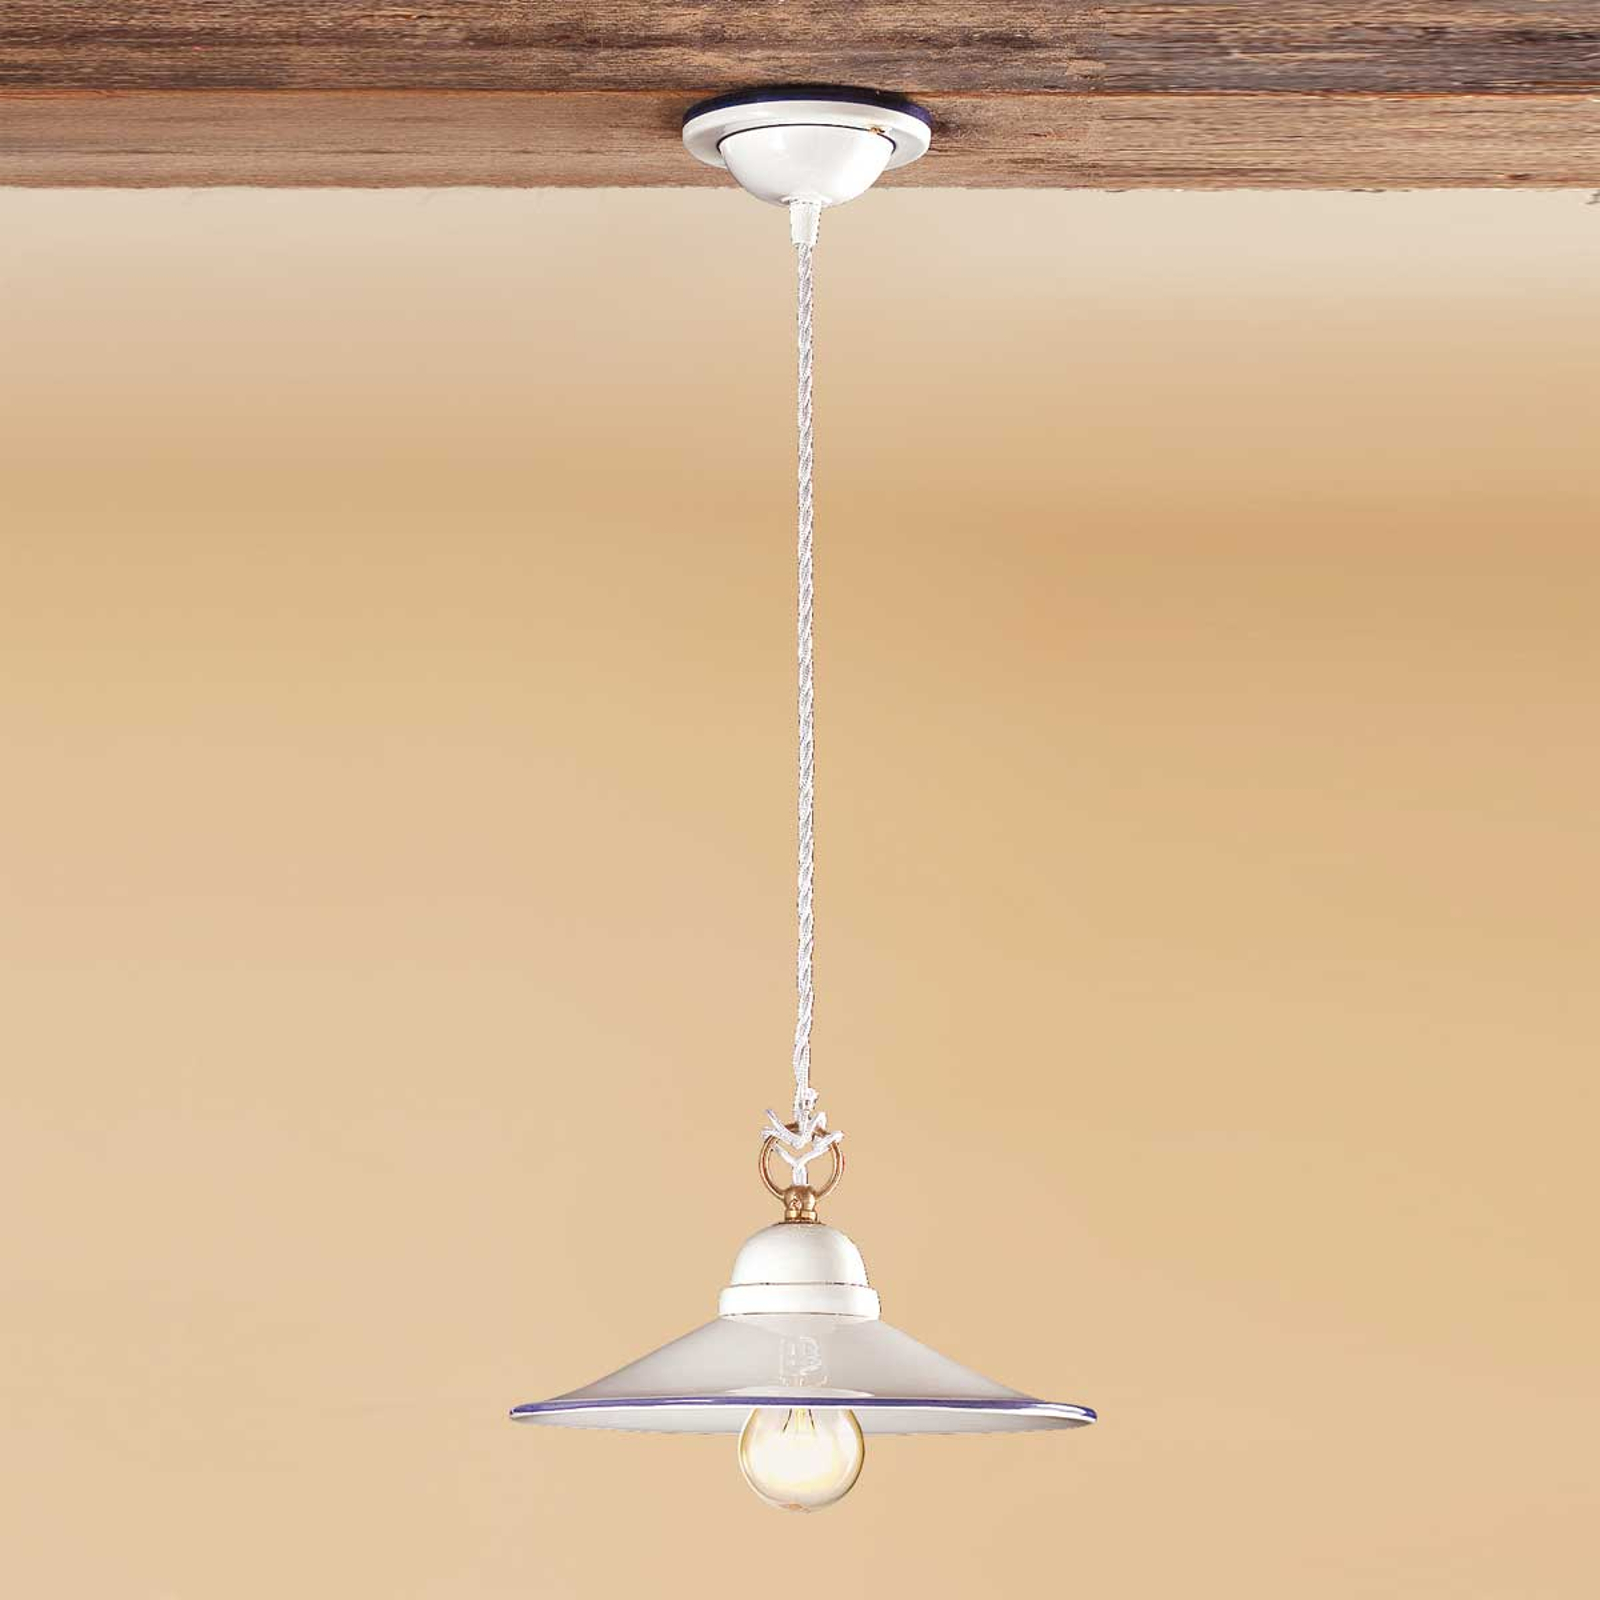 Závesná lampa PIATTO z keramiky_2013008X_1